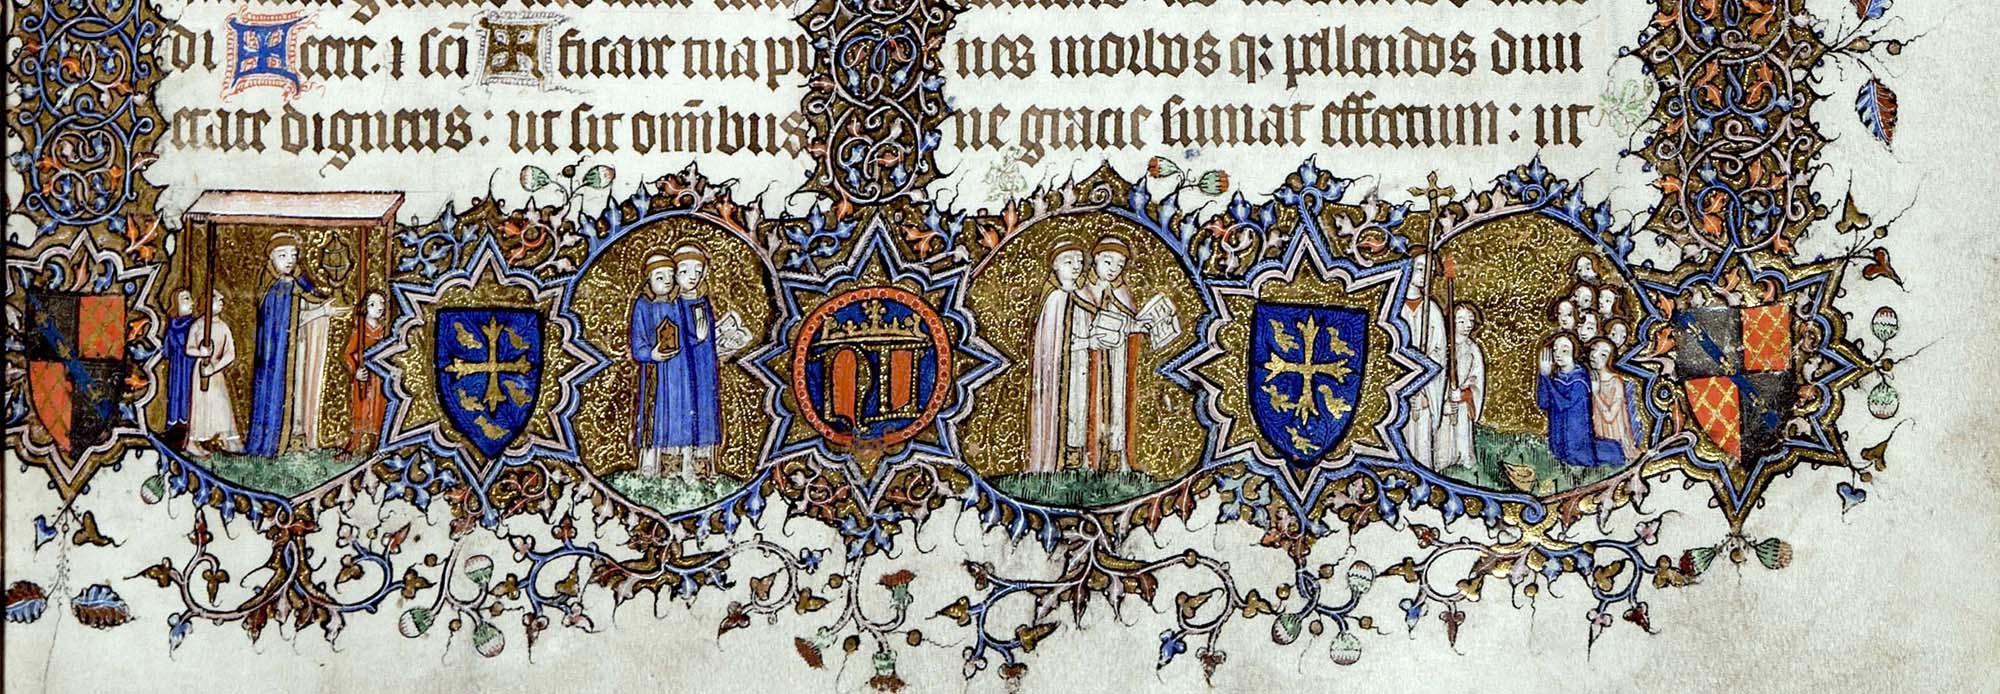 an illuminated border from an illuminated manuscript with figures, heraldic symbols and golden wreathwork